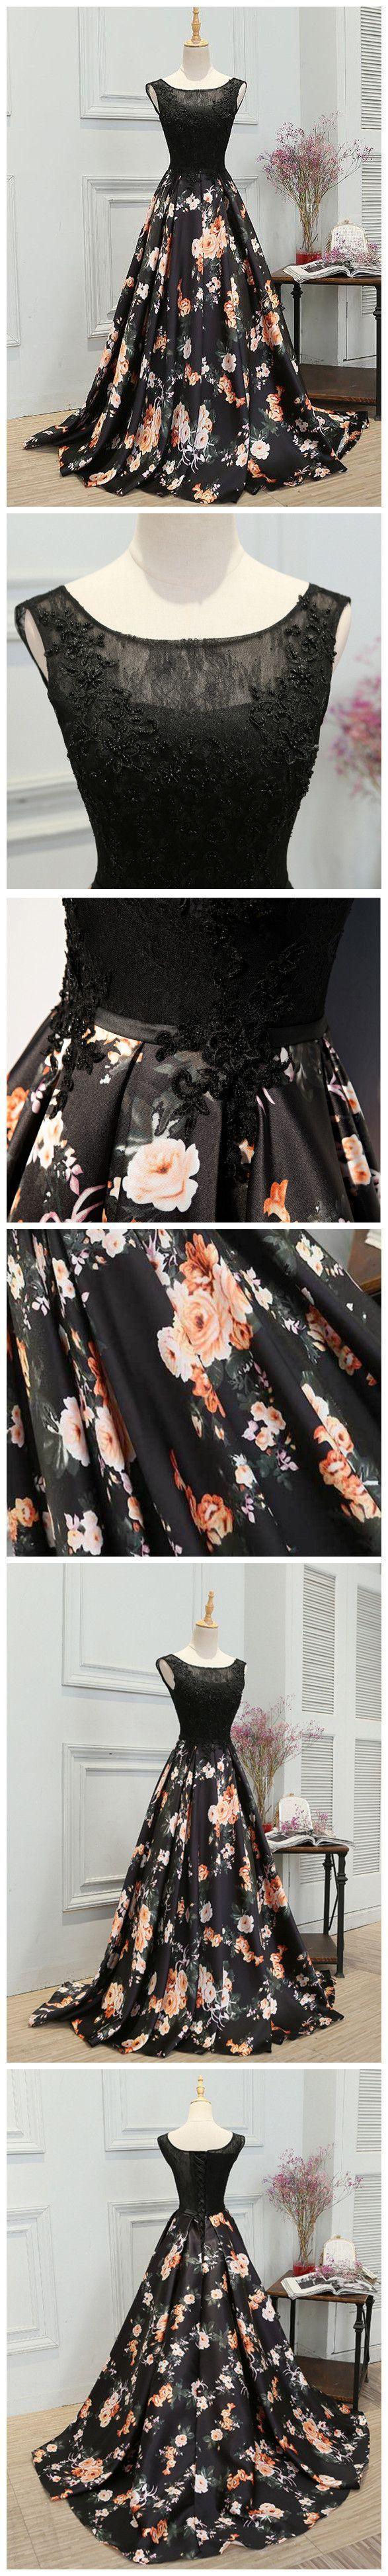 Chic aline scoop satin black lace sleeveless long prom dress